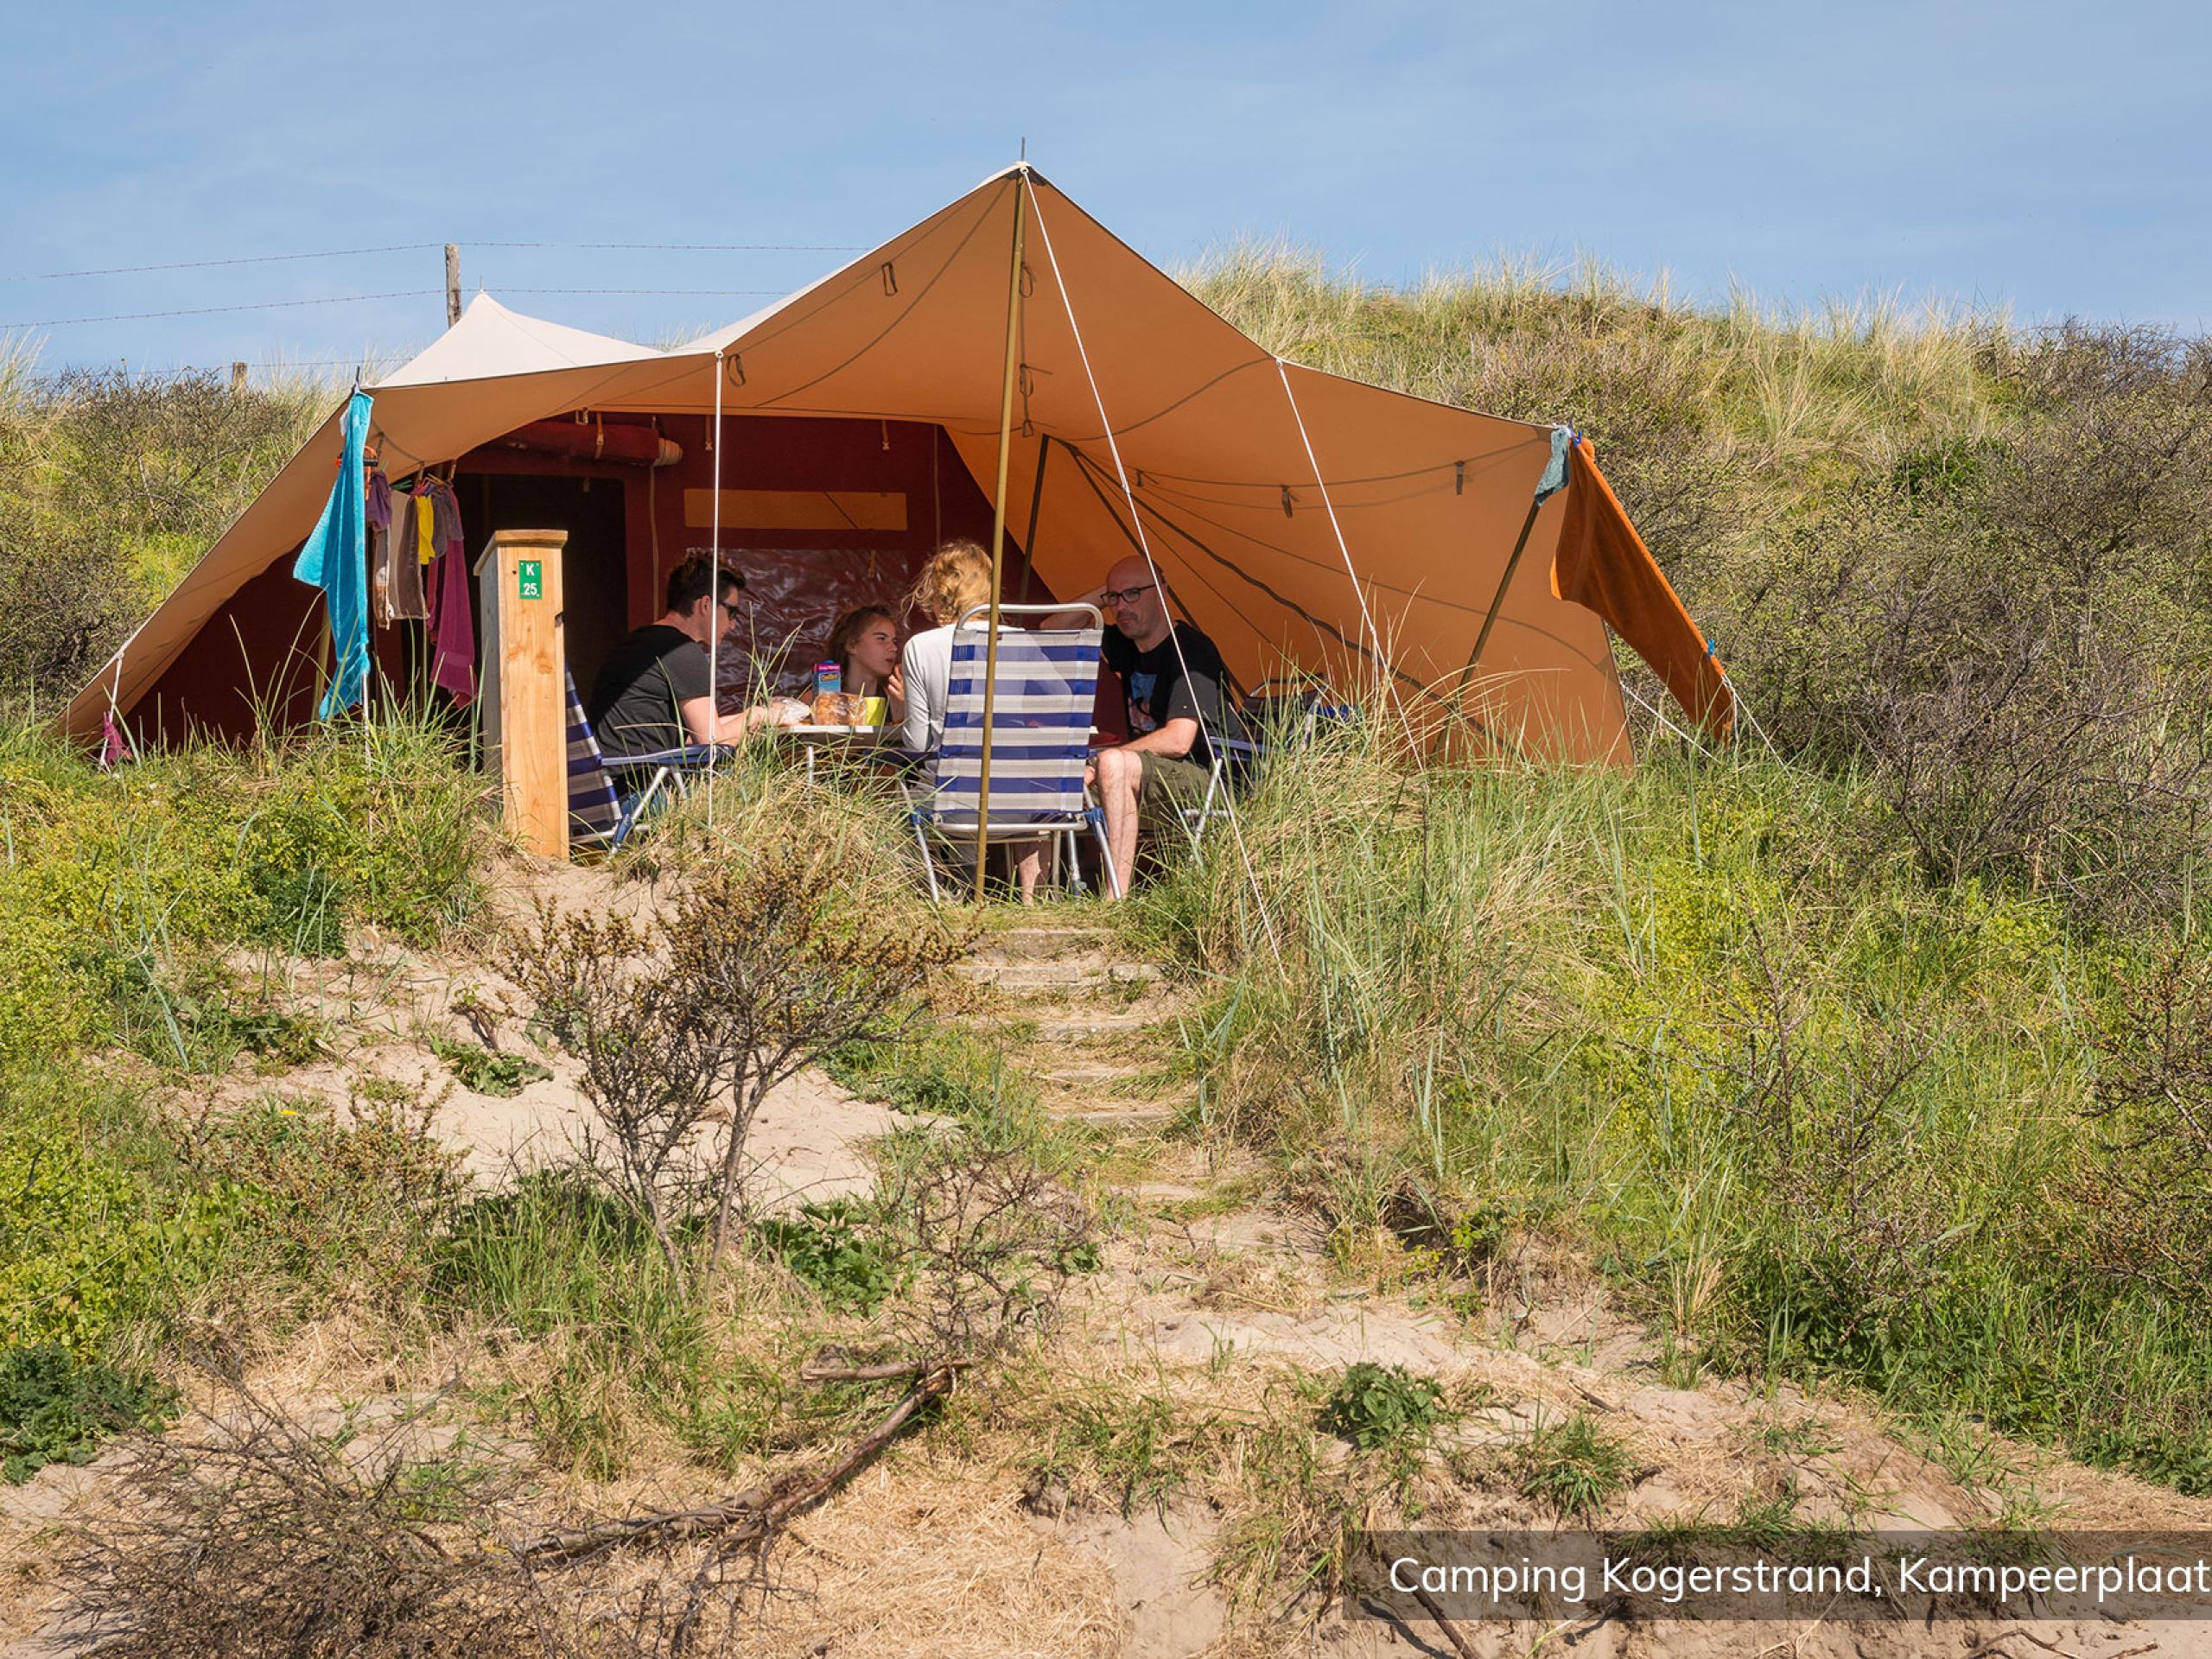 Camping in der Mitte der Texel Dünen am Noordzeestrand in De Koog